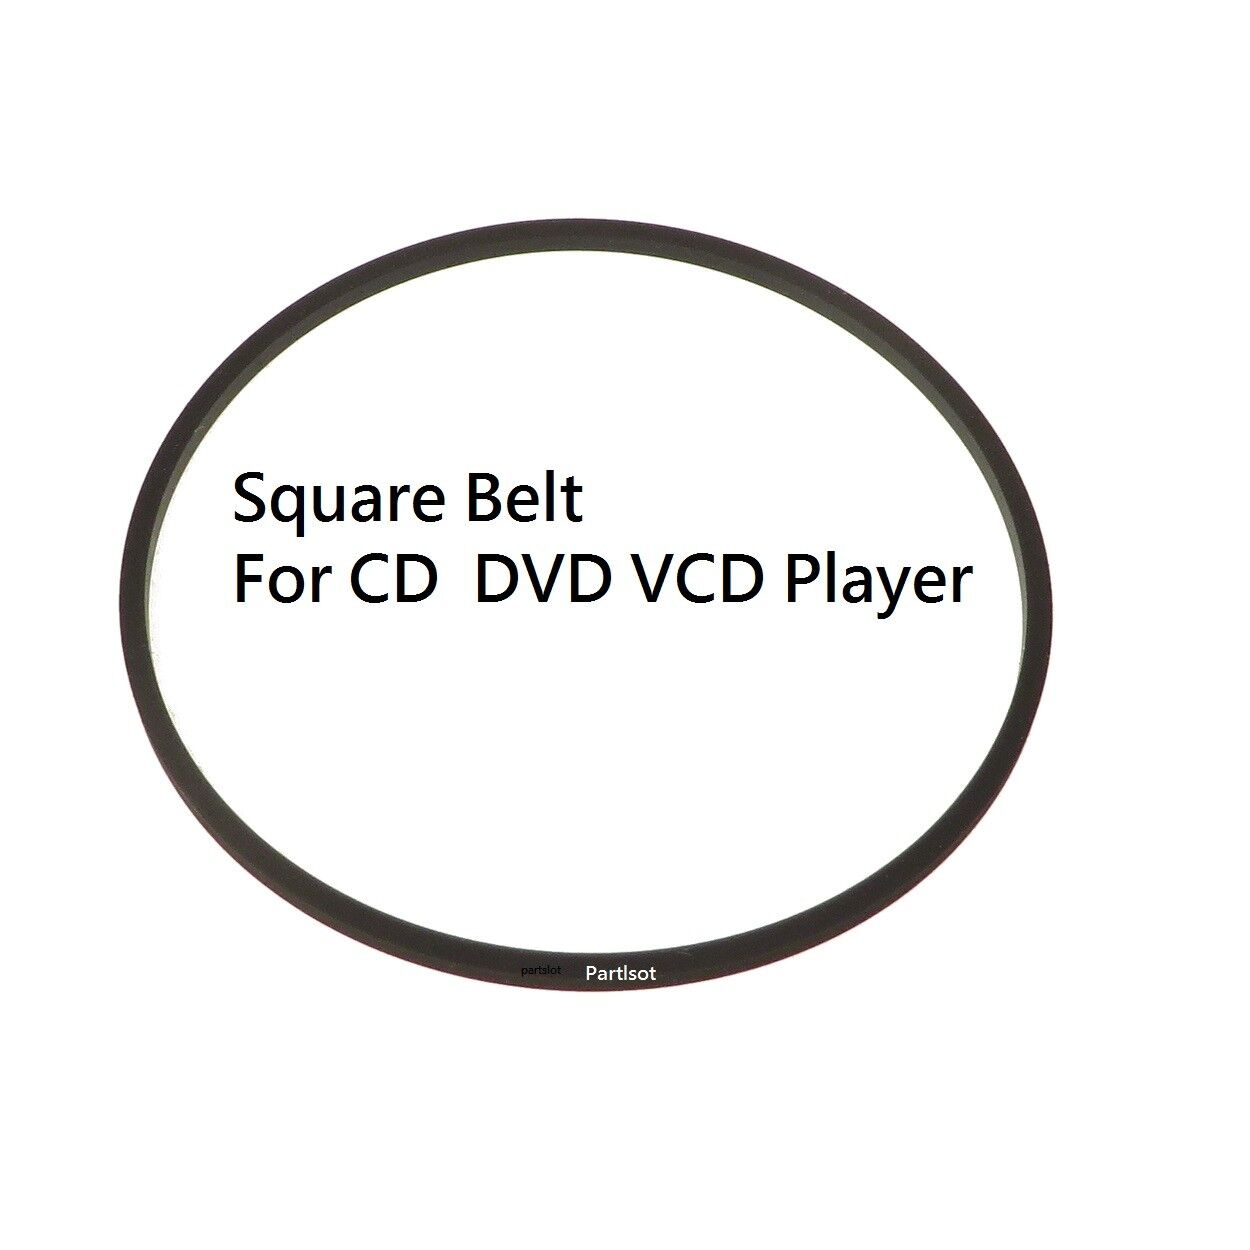 MARANTZ CD-7 CD-94 CD-95 CD-99 CD Player square rubber